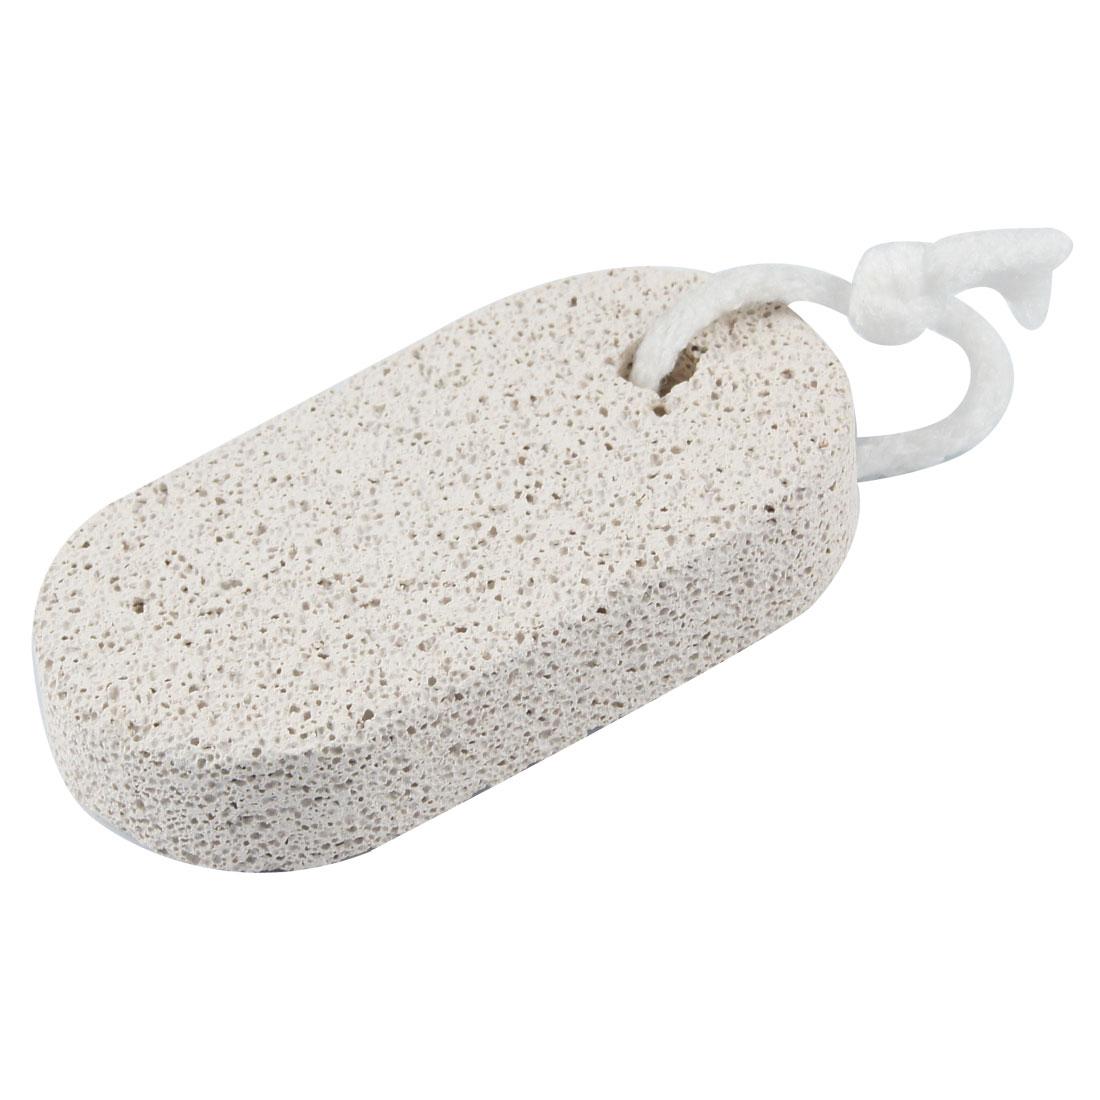 Unique Bargains Oval Shape Pumice Stone Foot File Callus ... Pumice Stone For Feet